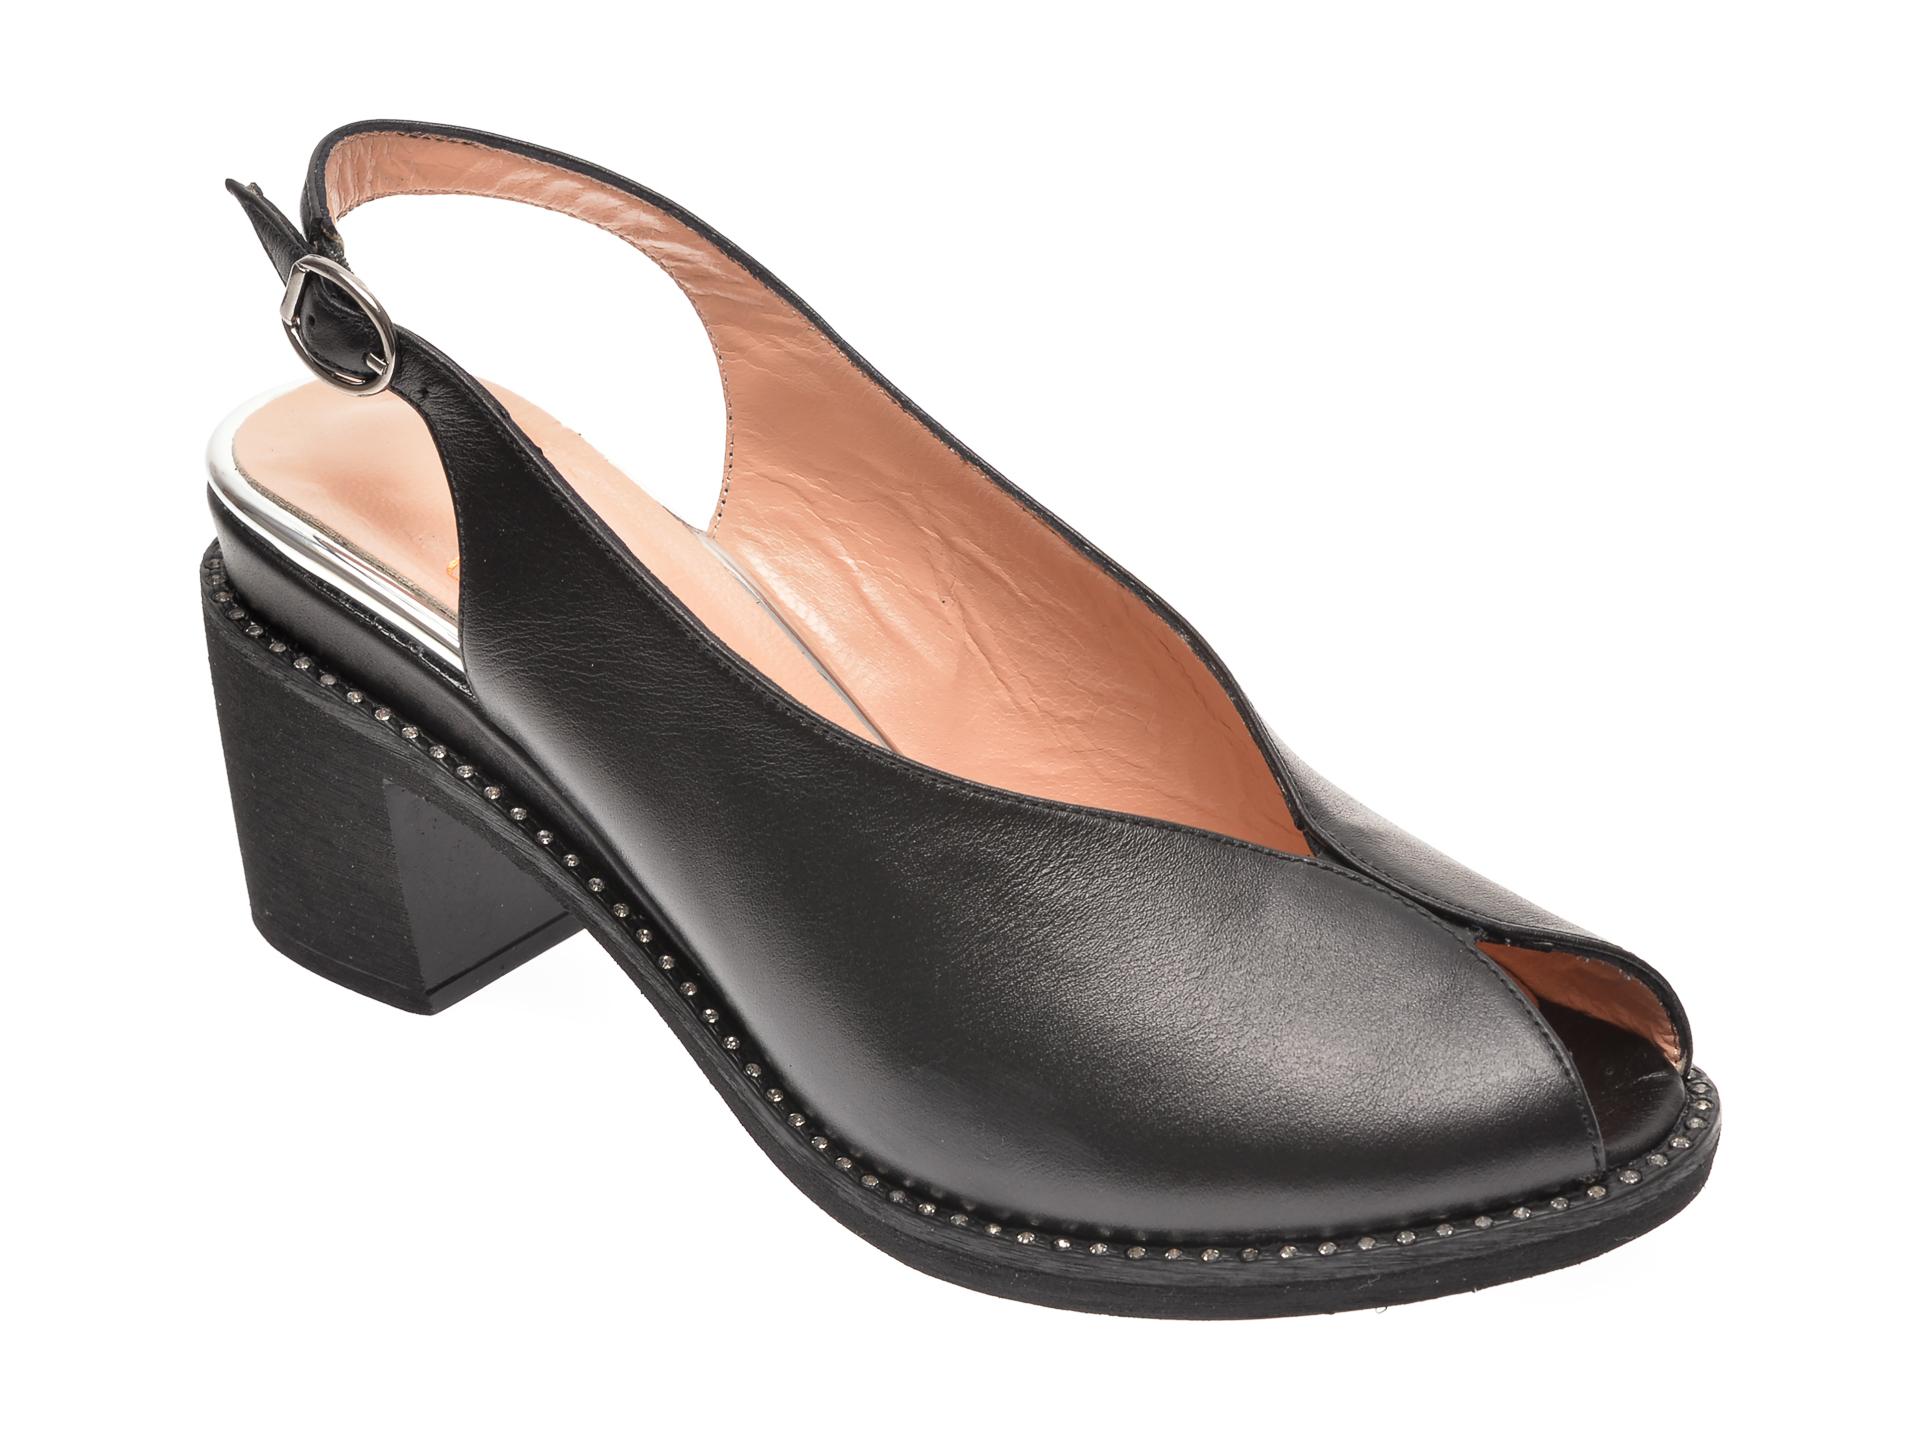 Sandale MOLLY BESSA negre, 285281, din piele naturala